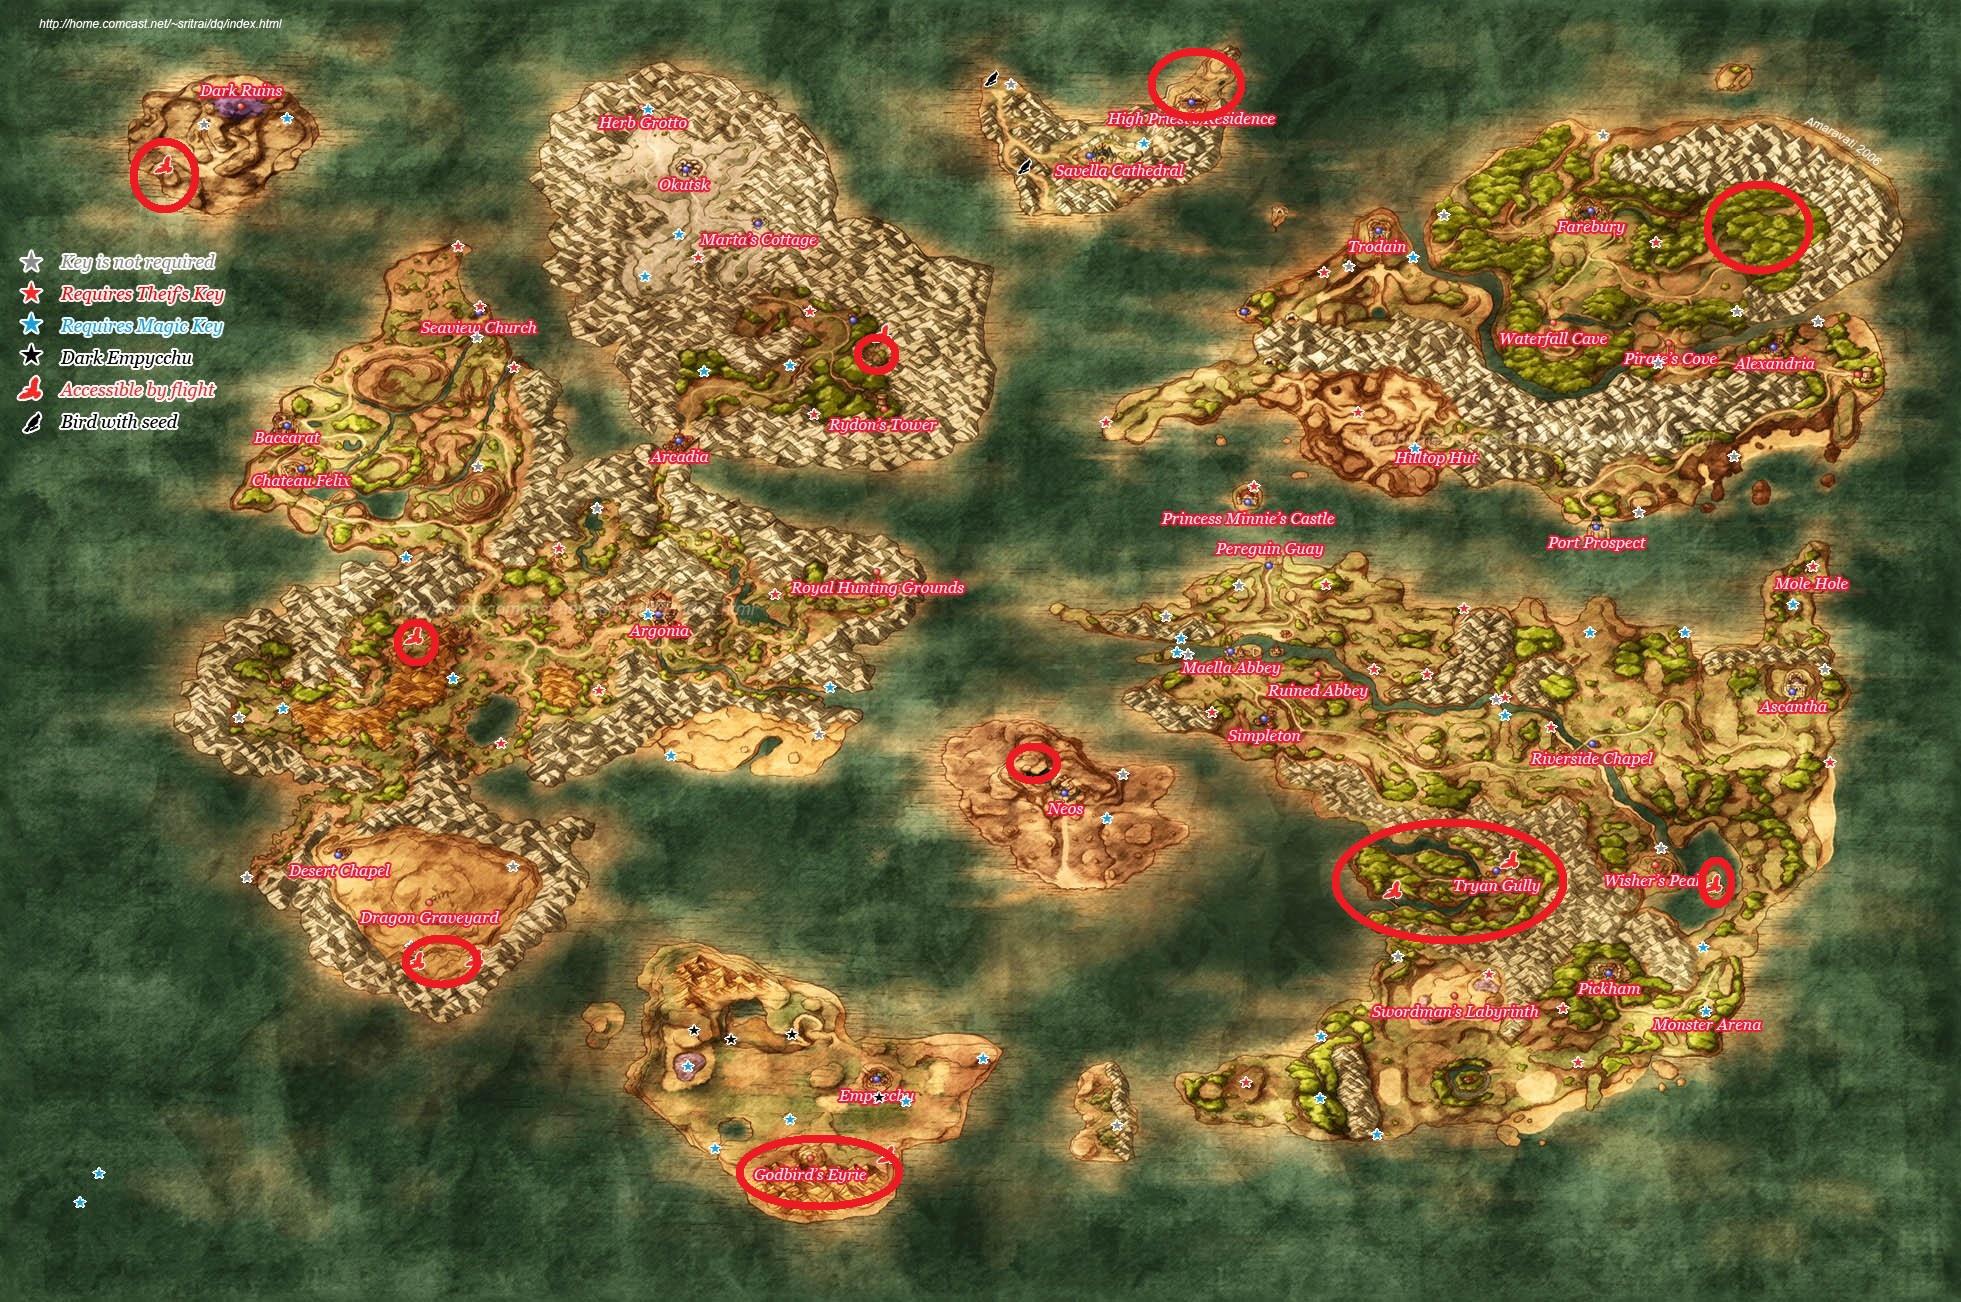 baccarat location dragon quest 8